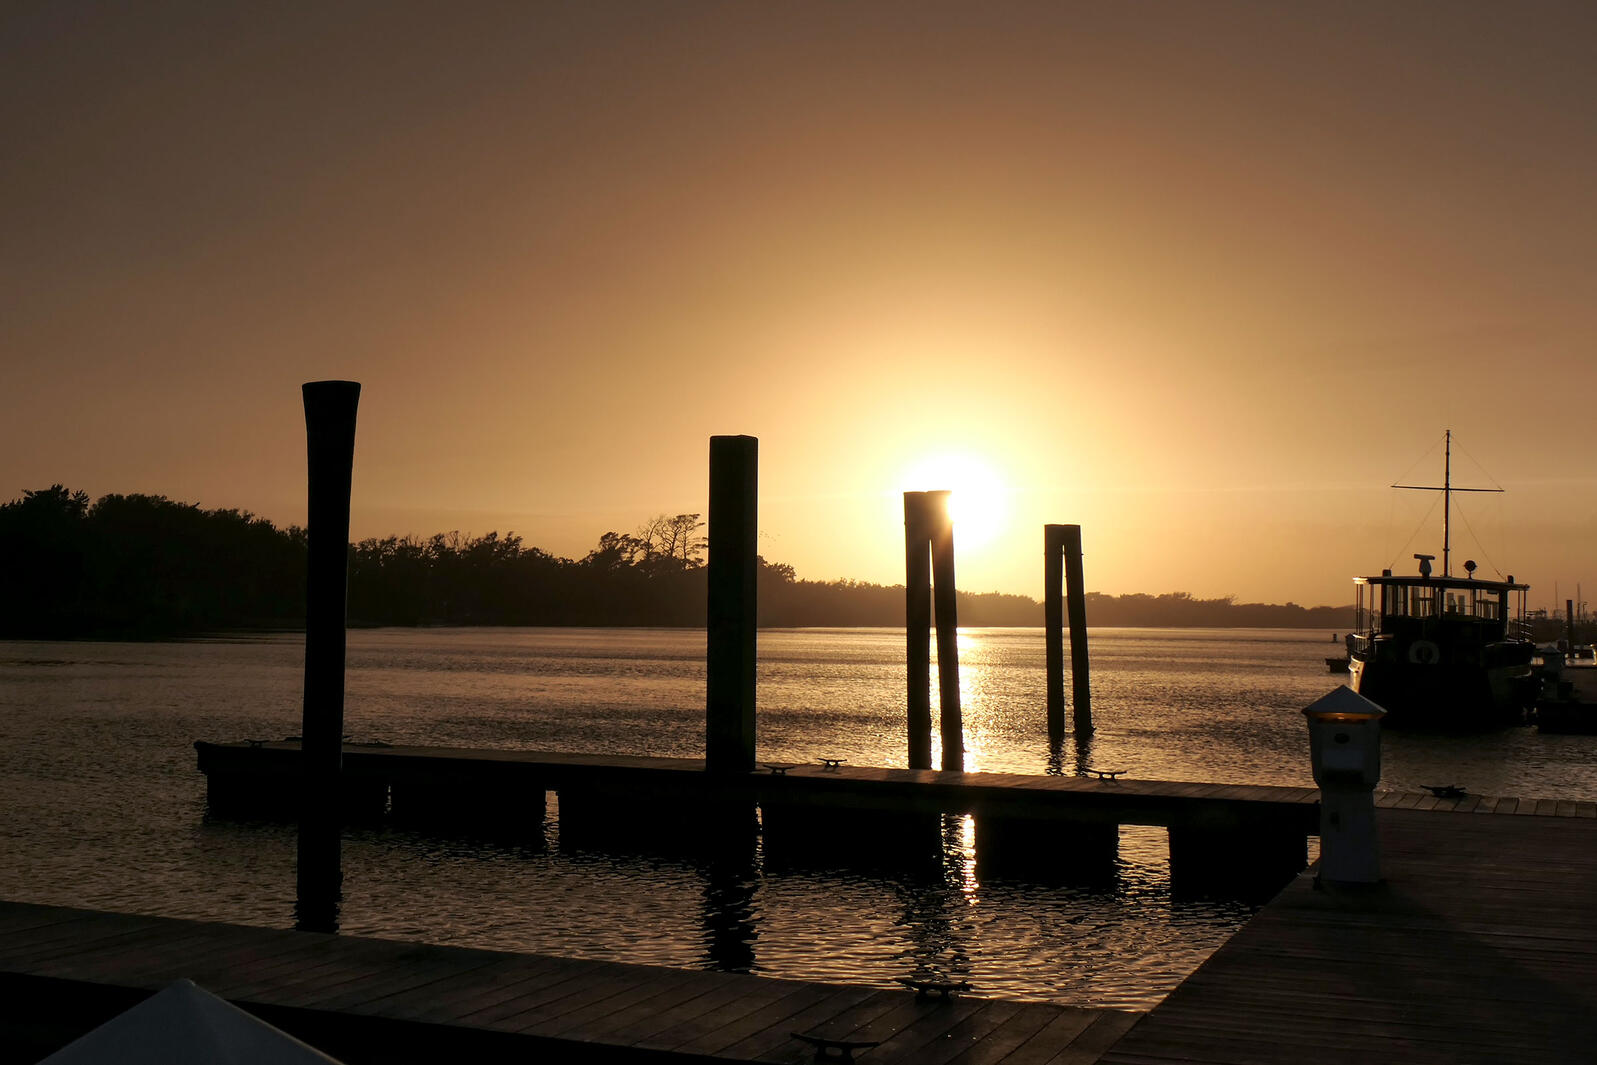 The docks in Beaufort, North Carolina, where the author's adventure began. Megan Mayhew Bergman